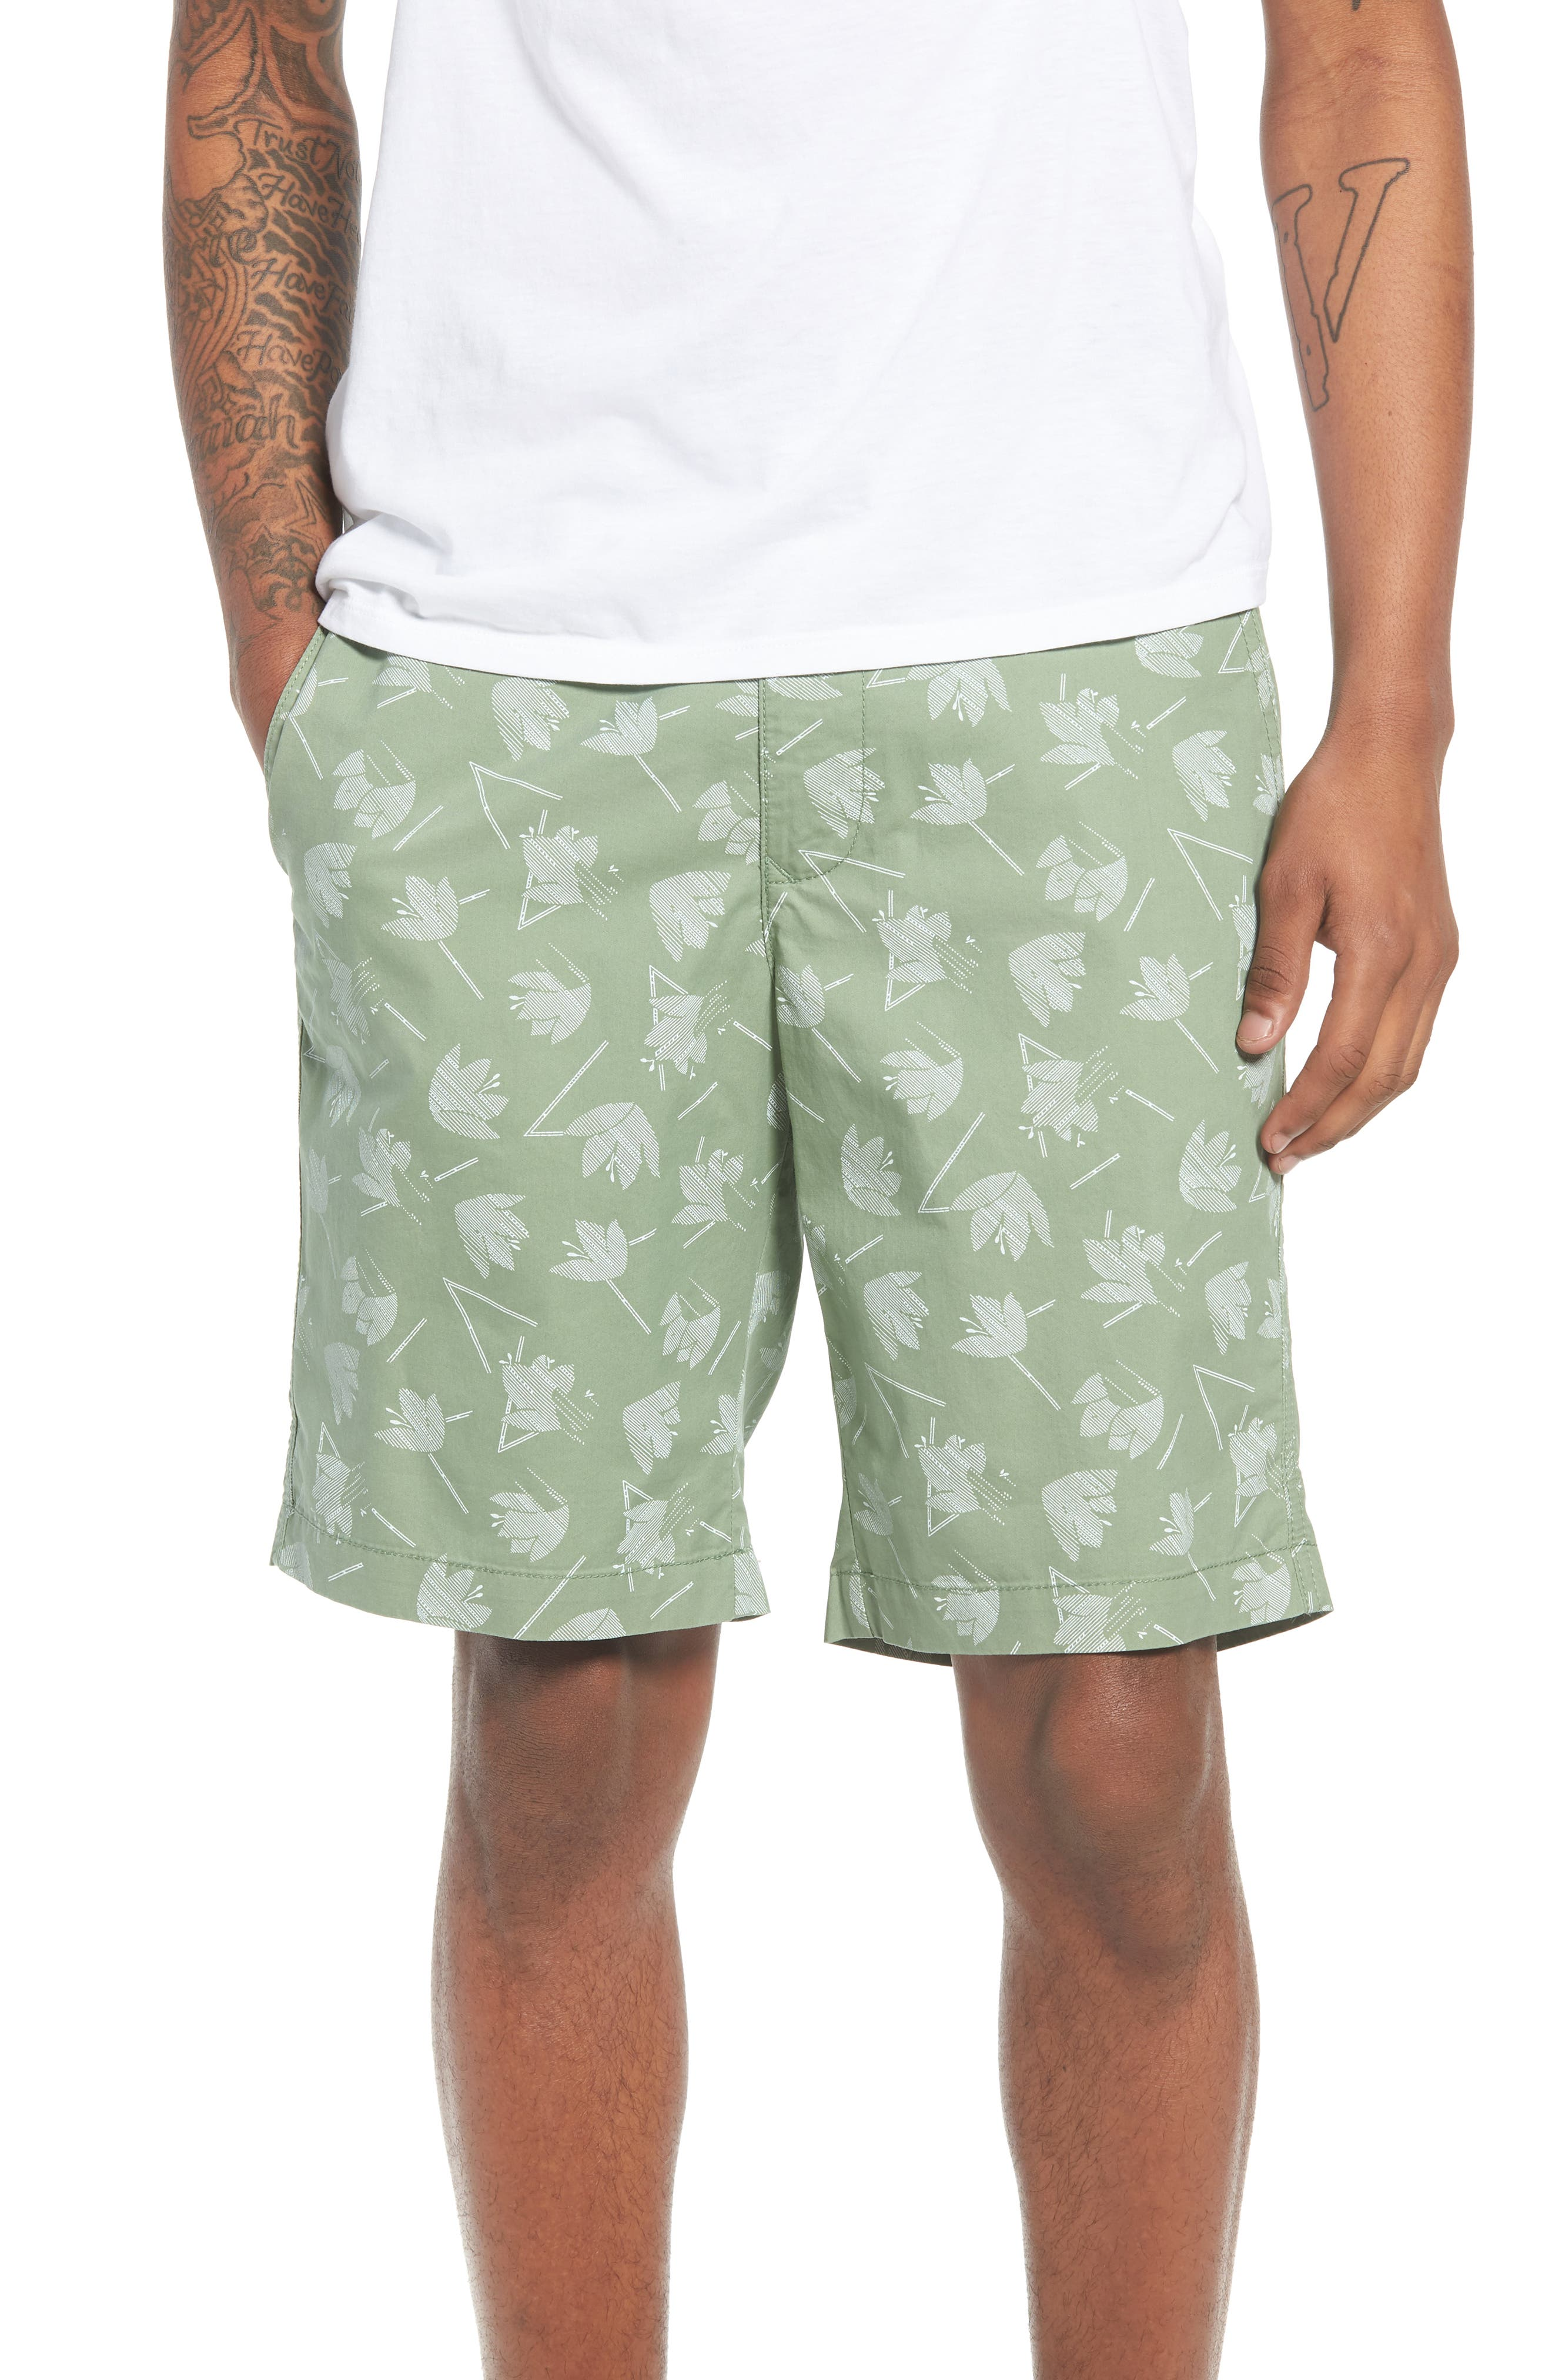 Deco Floral Print Shorts,                             Main thumbnail 1, color,                             Green Hedge Deco Floral